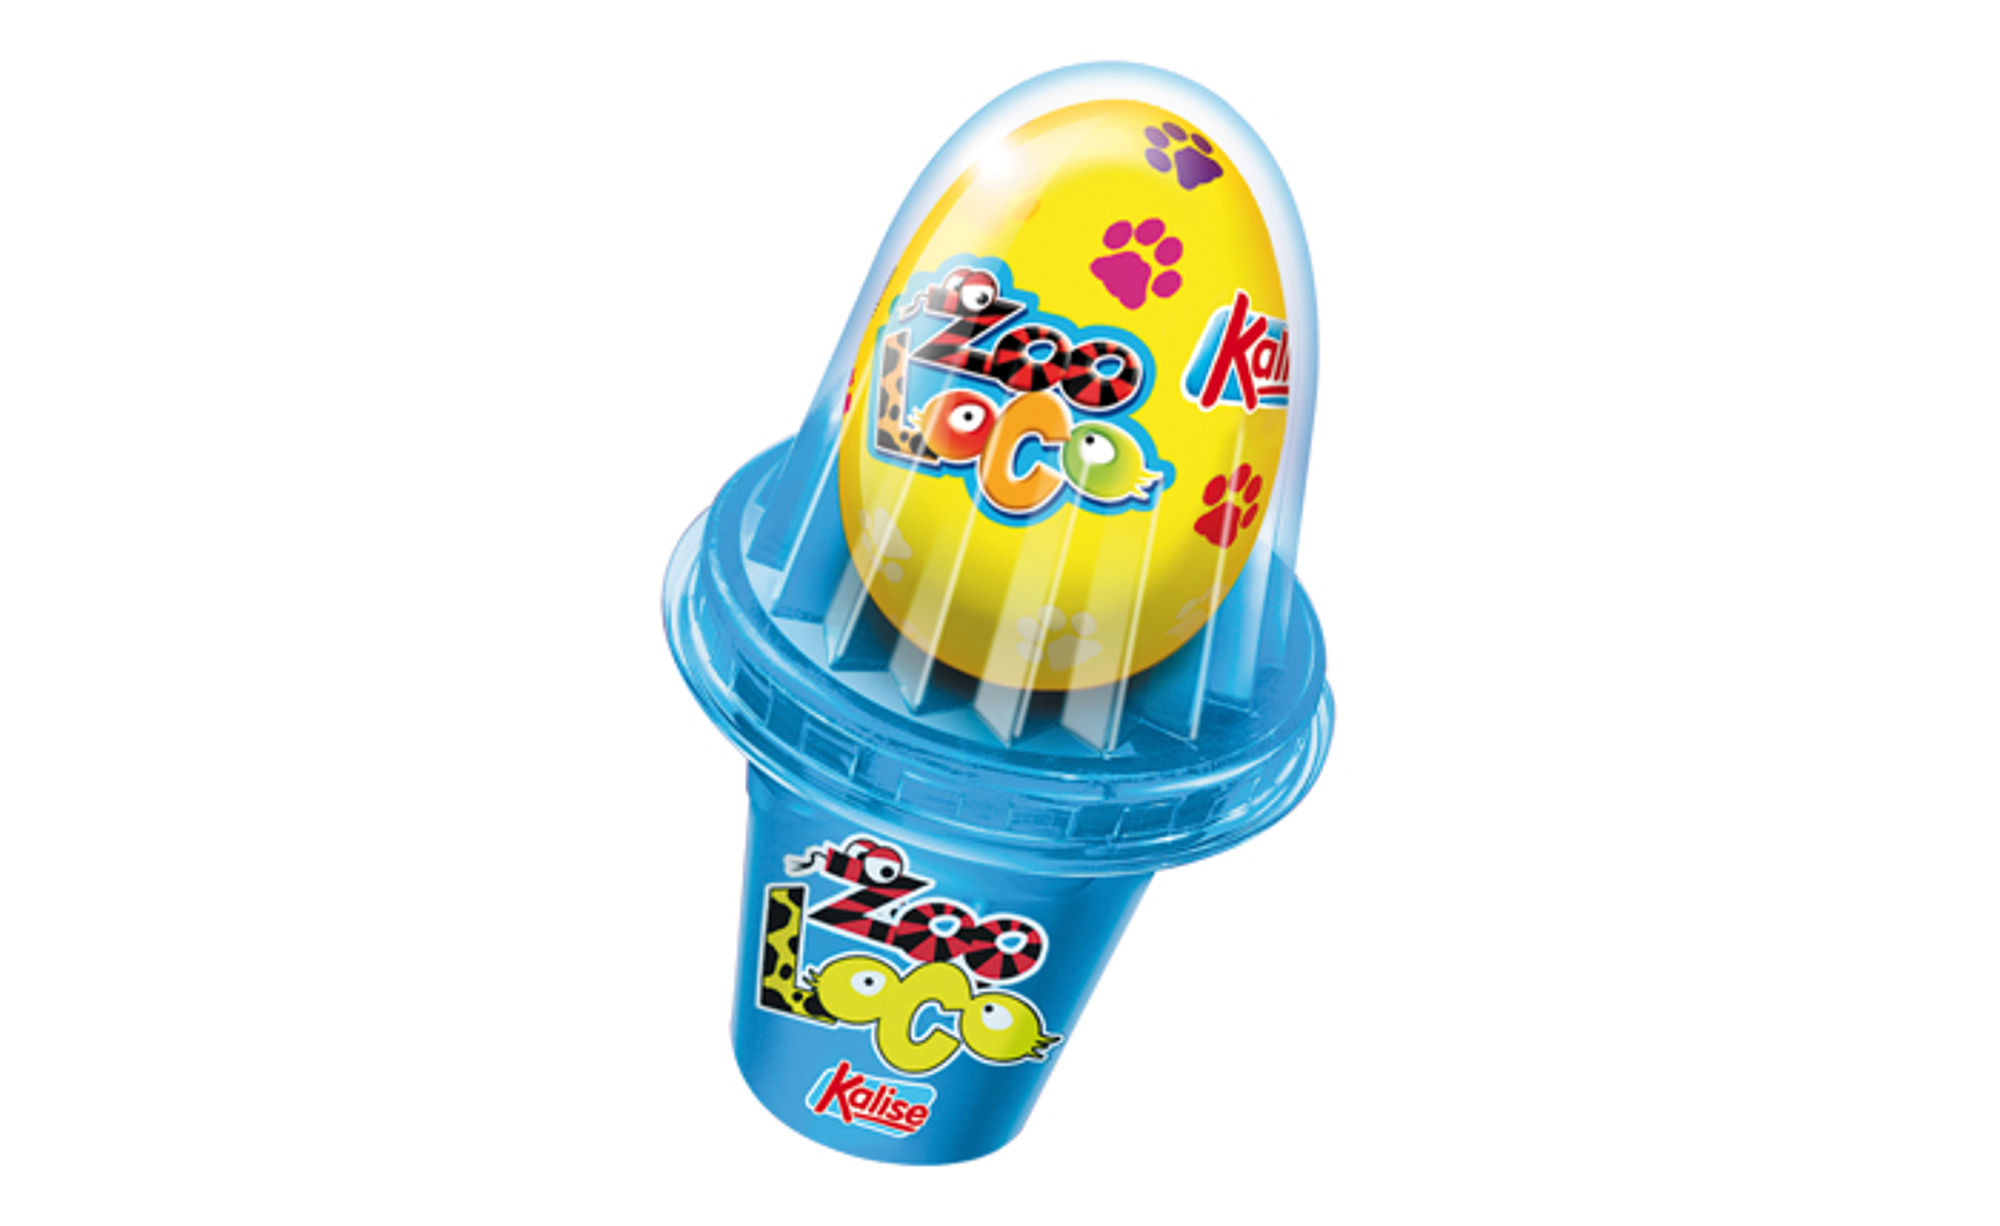 S 252 D Eis For Kids